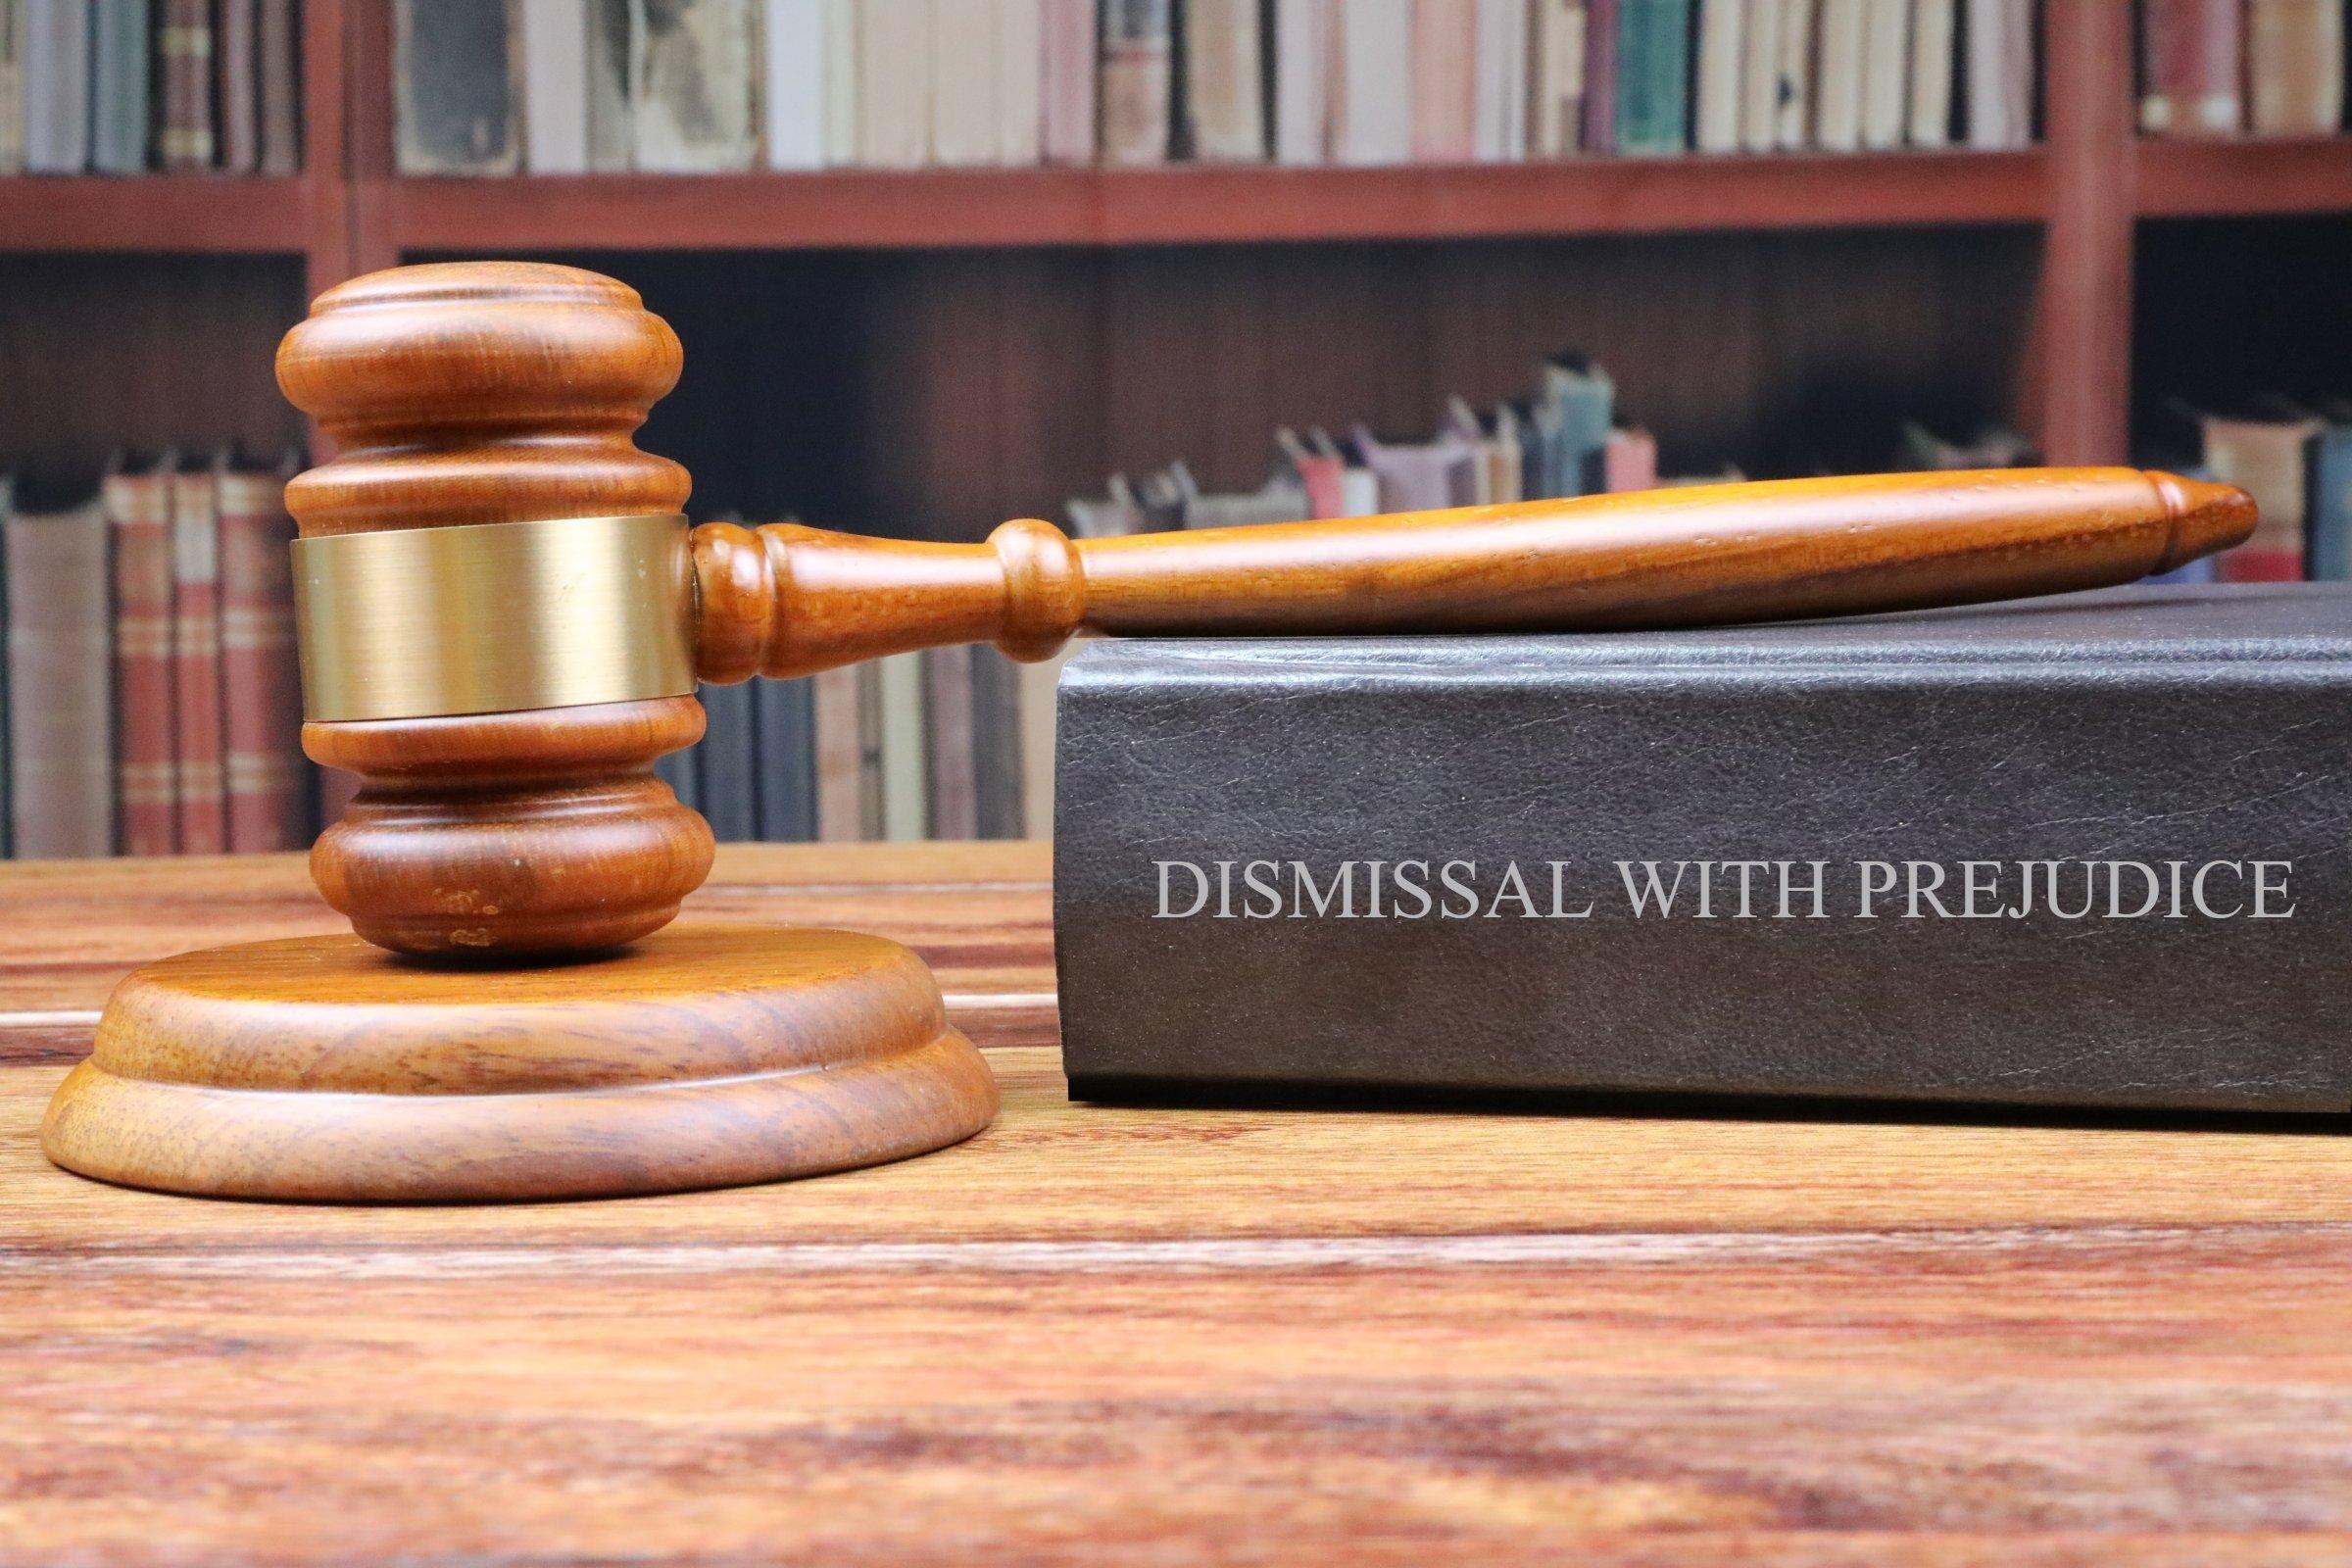 Dismissal With Prejudice